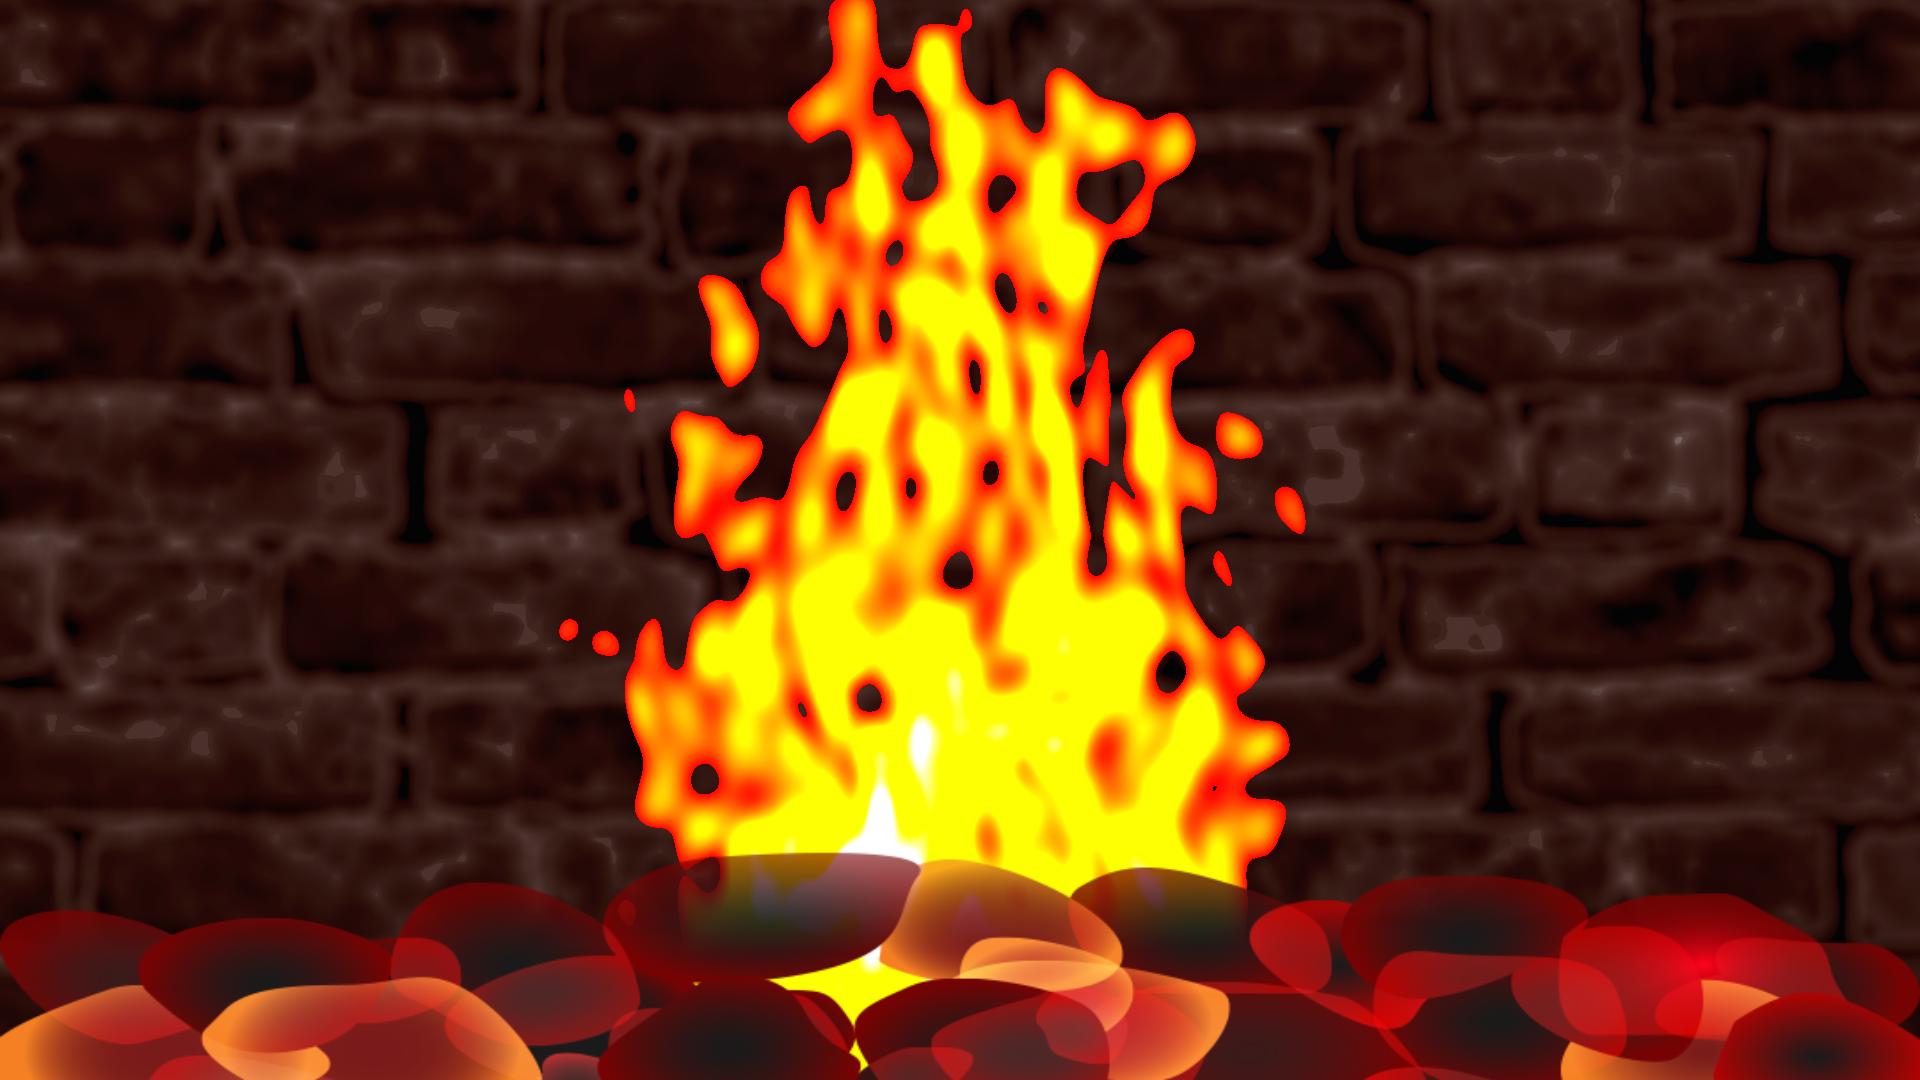 Sensory Flames - Free Fireplace for your TV screenshot 1